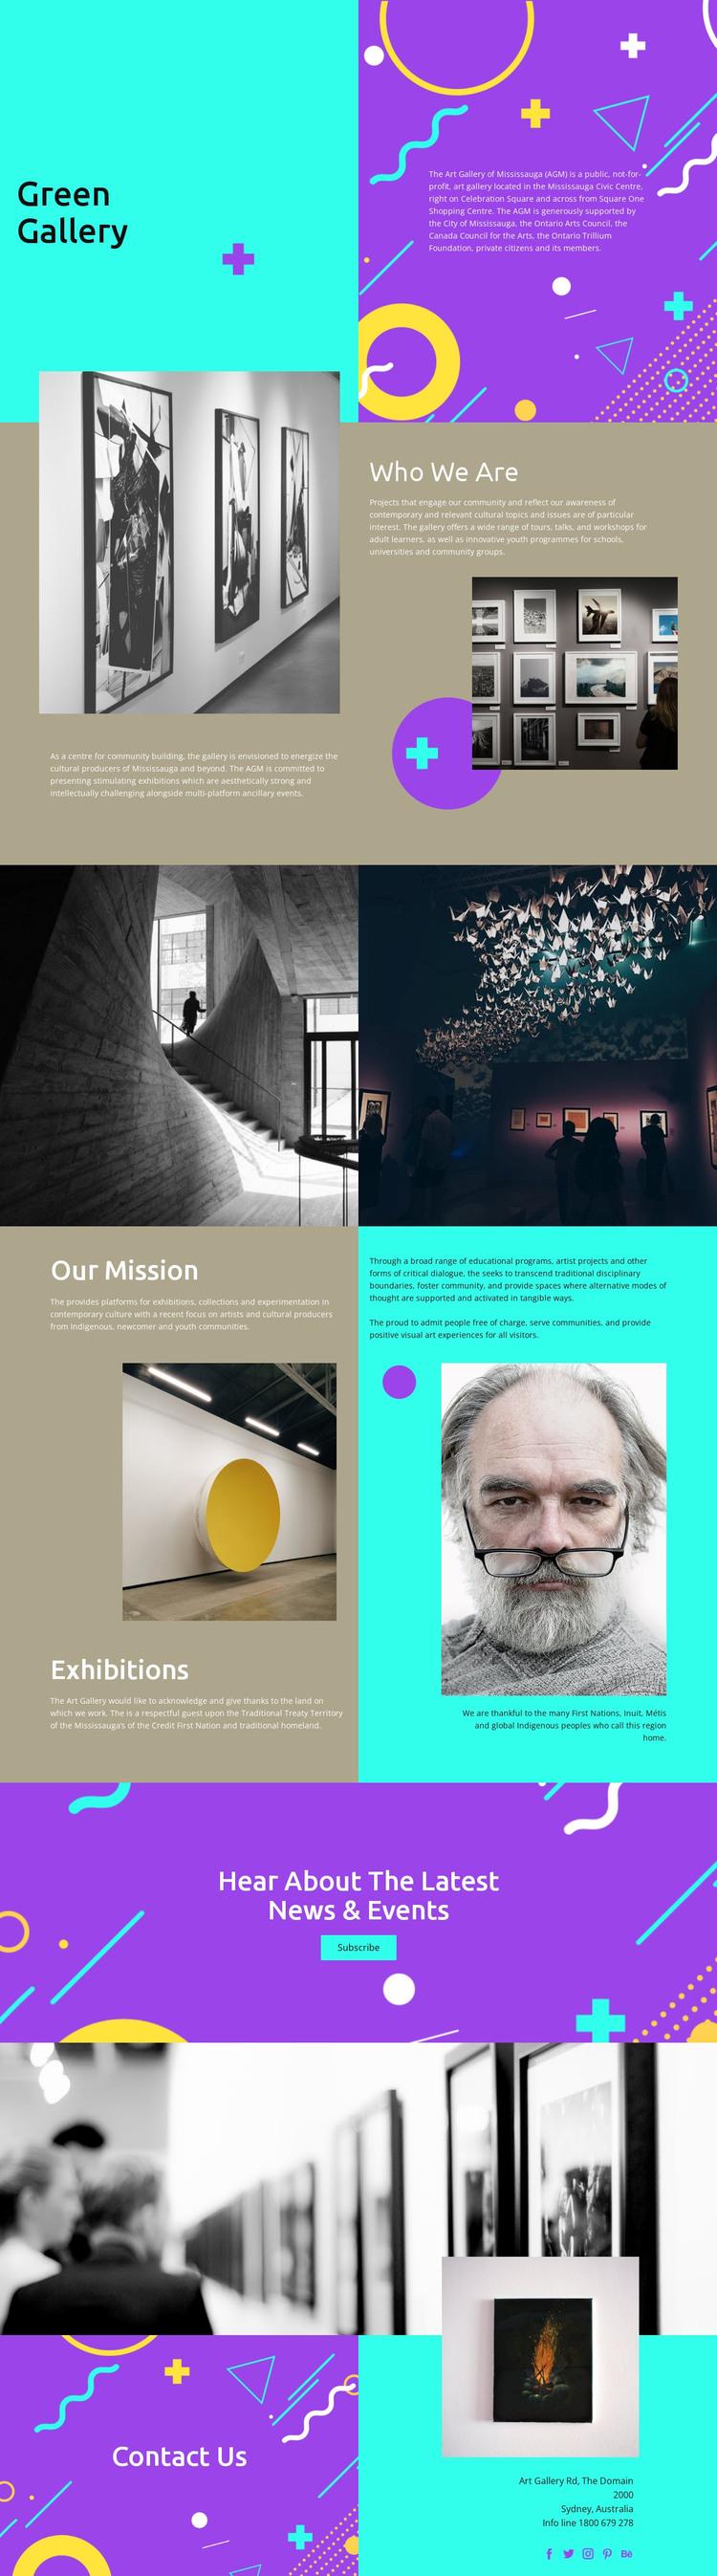 Gallery of fashion photographers WordPress Theme